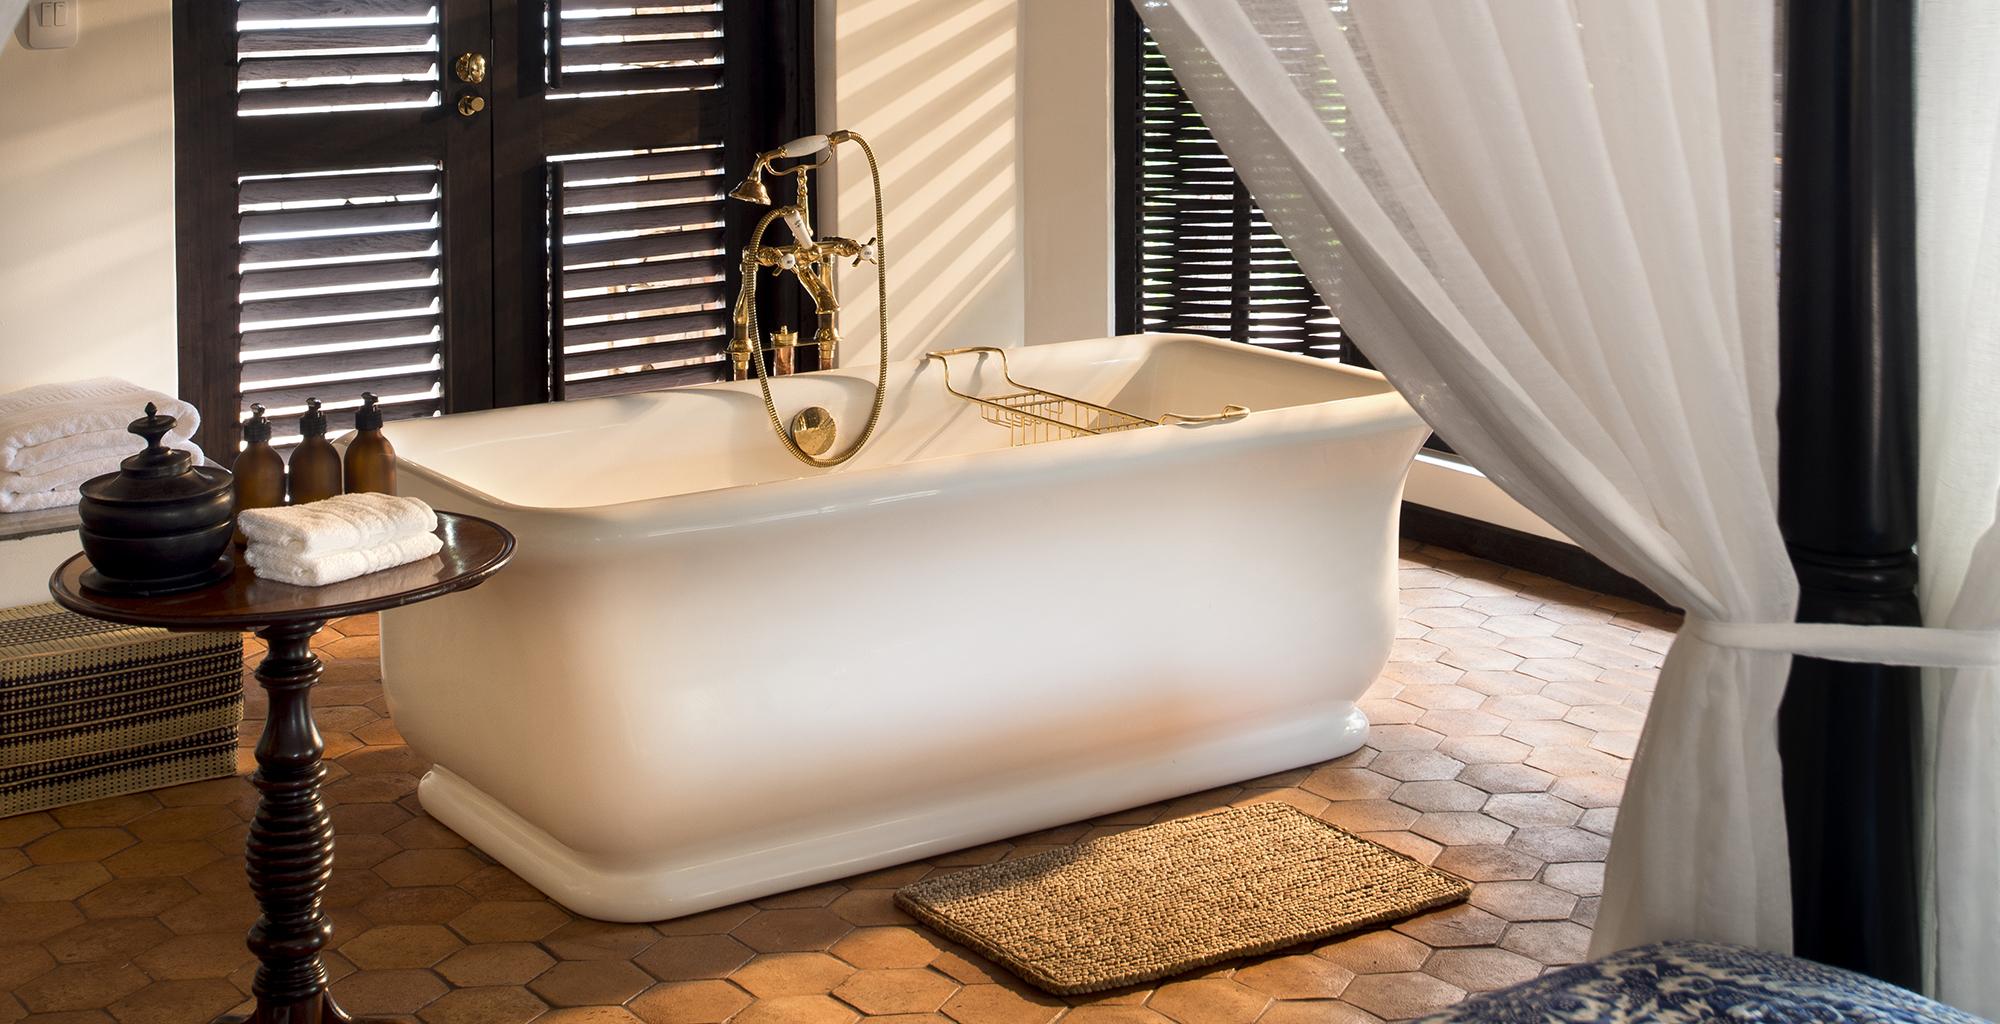 Mozambique-Bazaruto-Archipelago-Benguerra-Island-Lodge-Bathroom